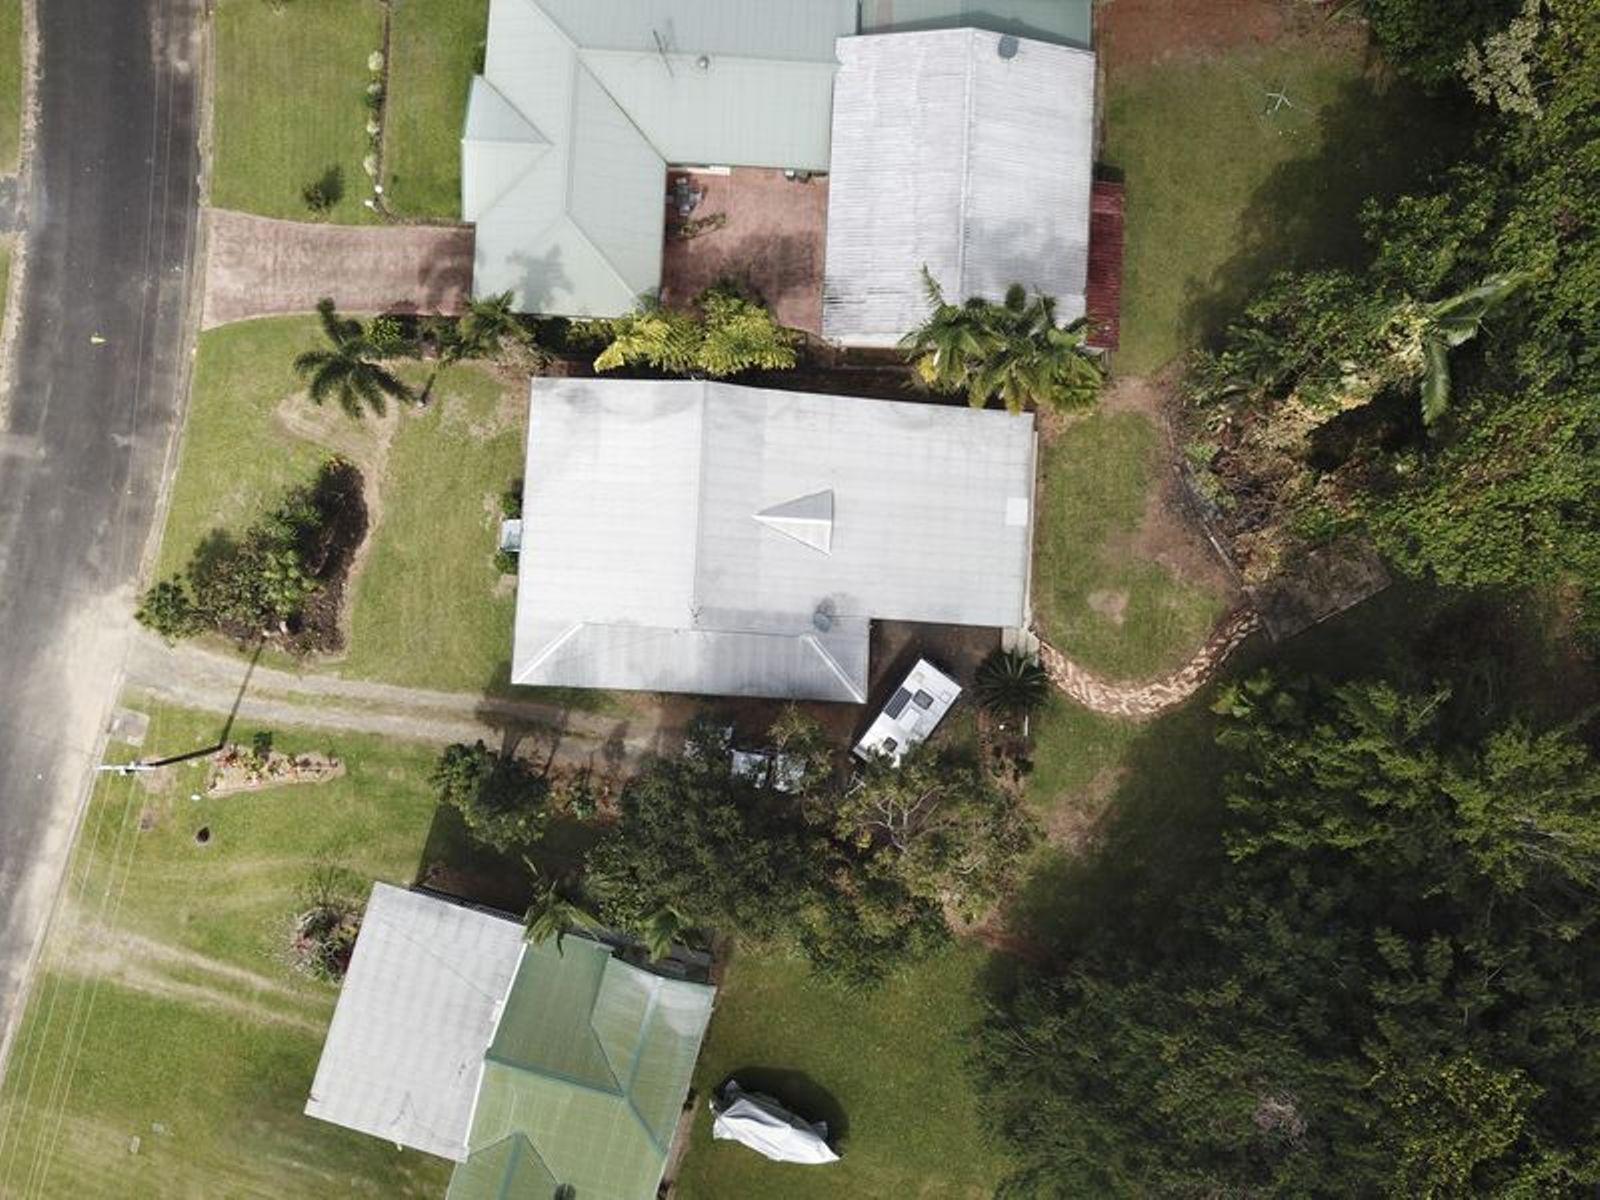 17 ENID Street, Flying Fish Point, QLD 4860